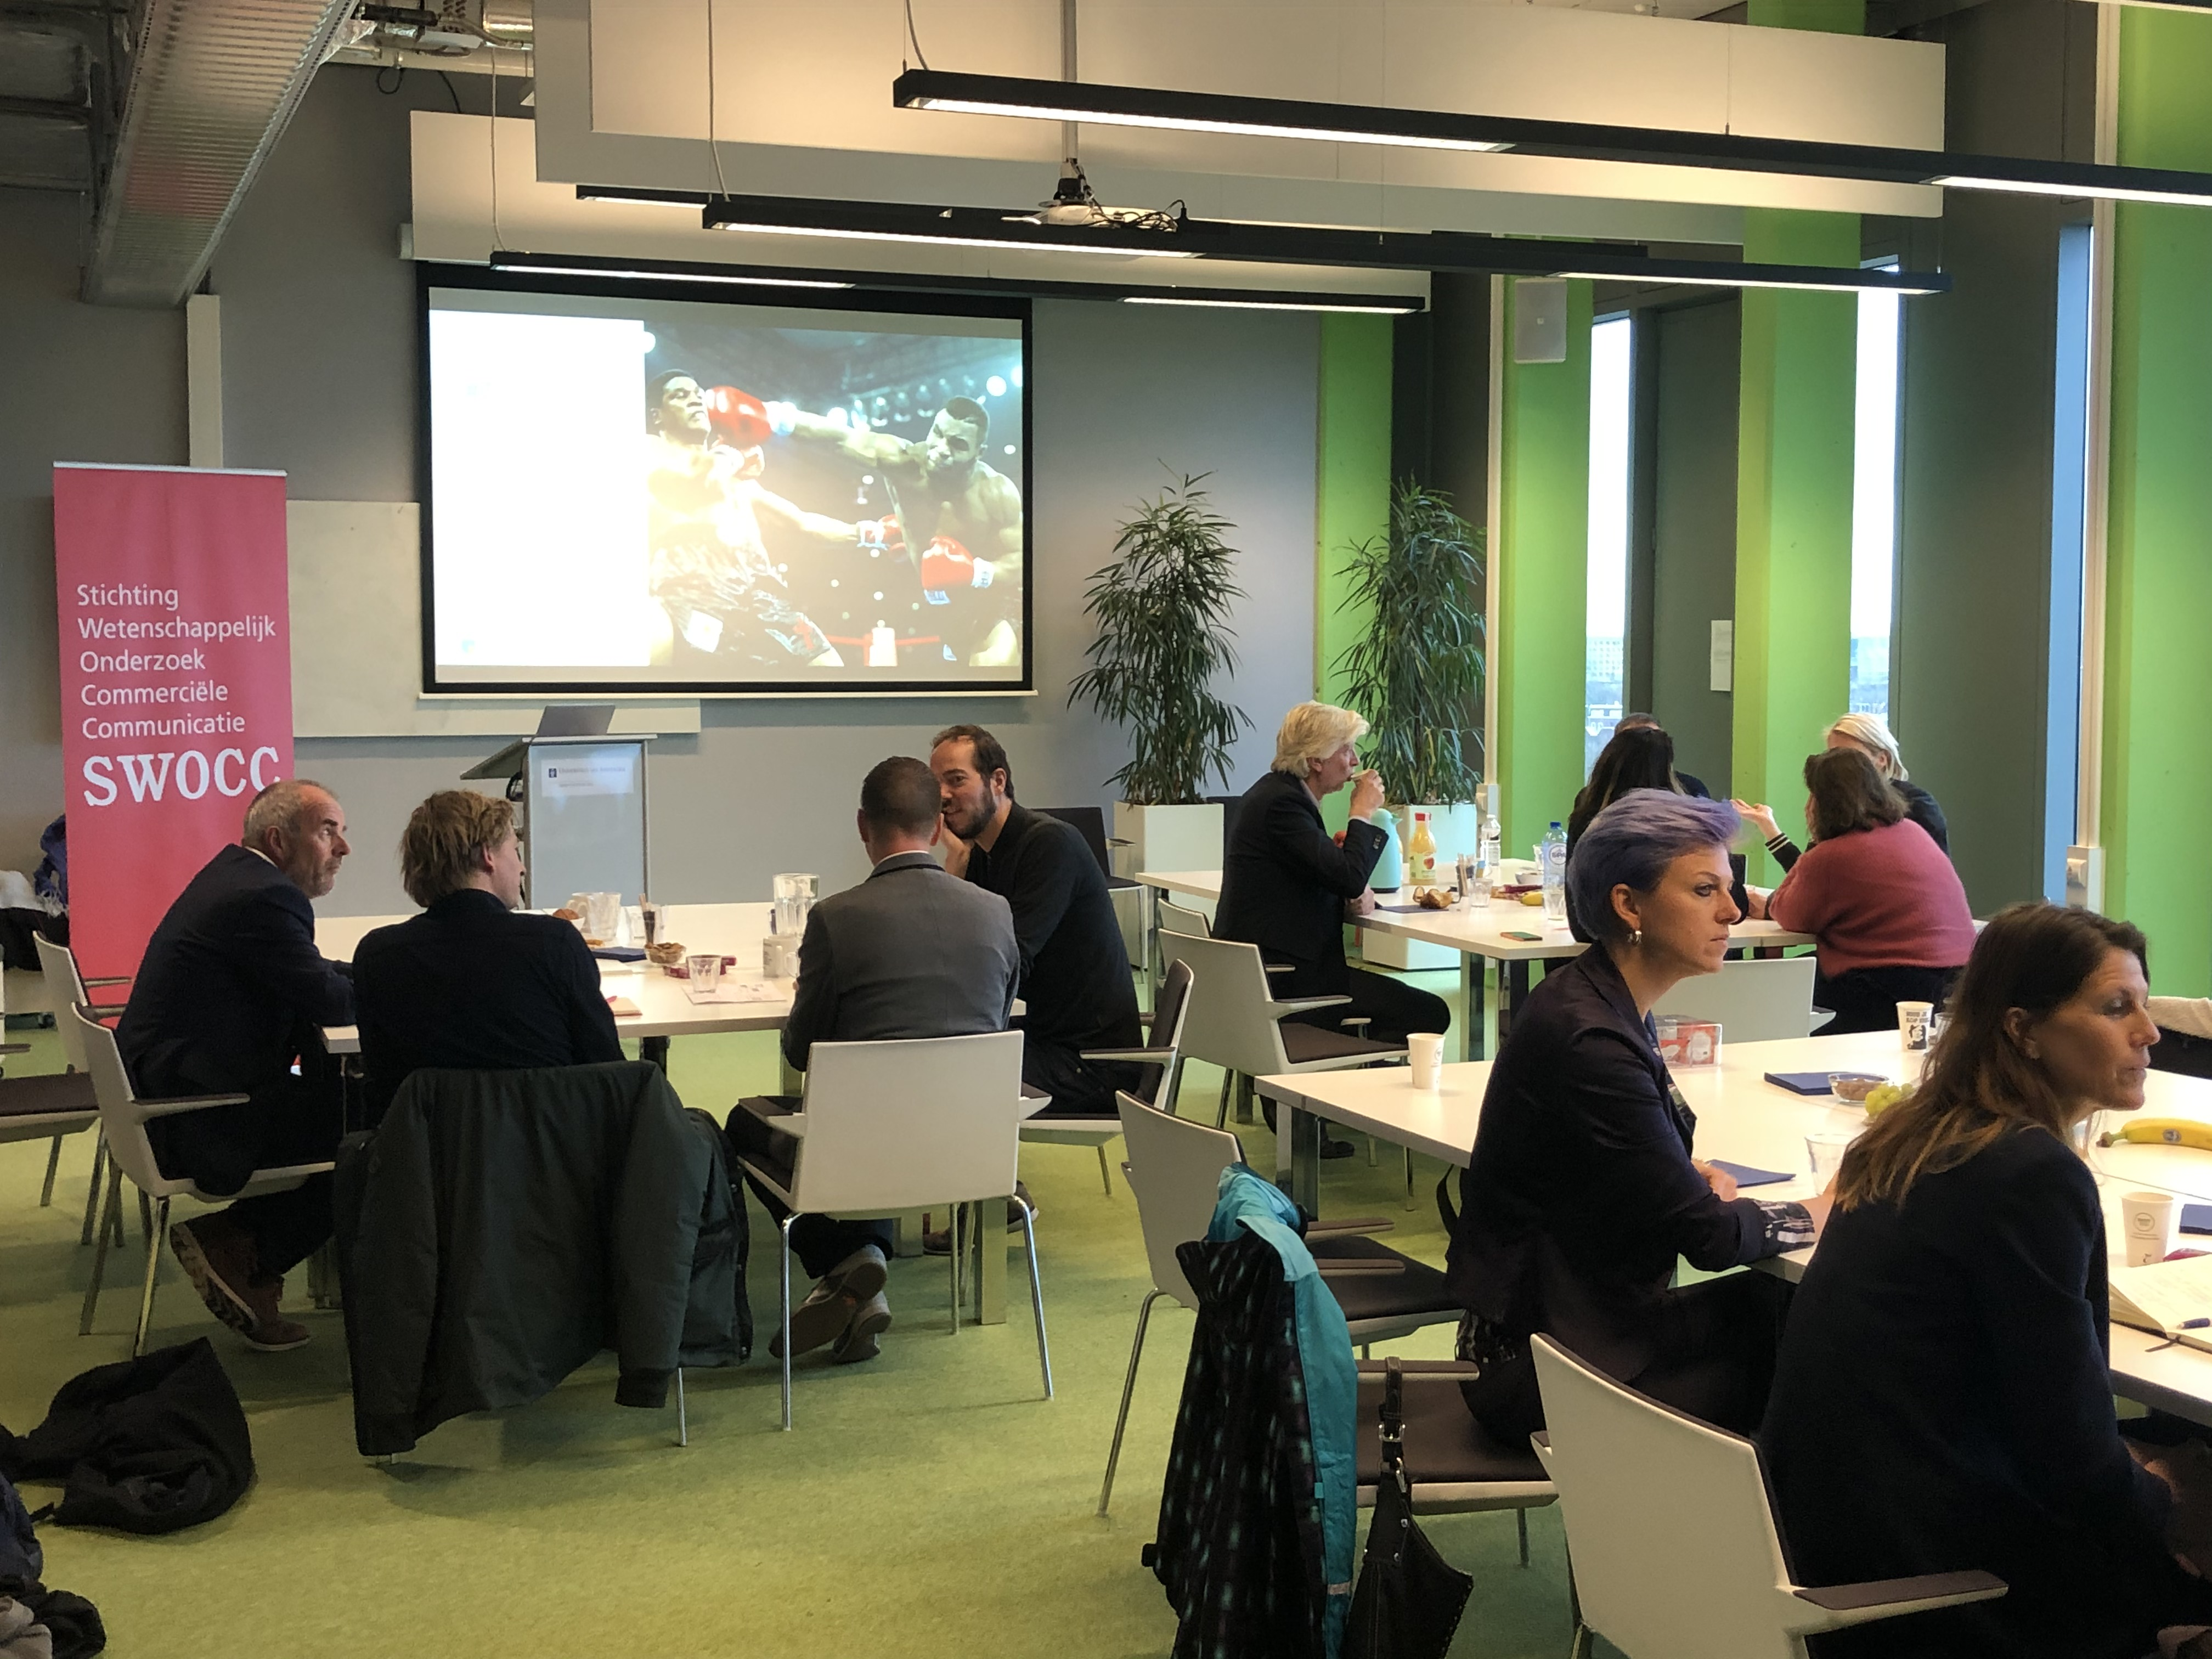 swocc merkportfolio workshop discussie